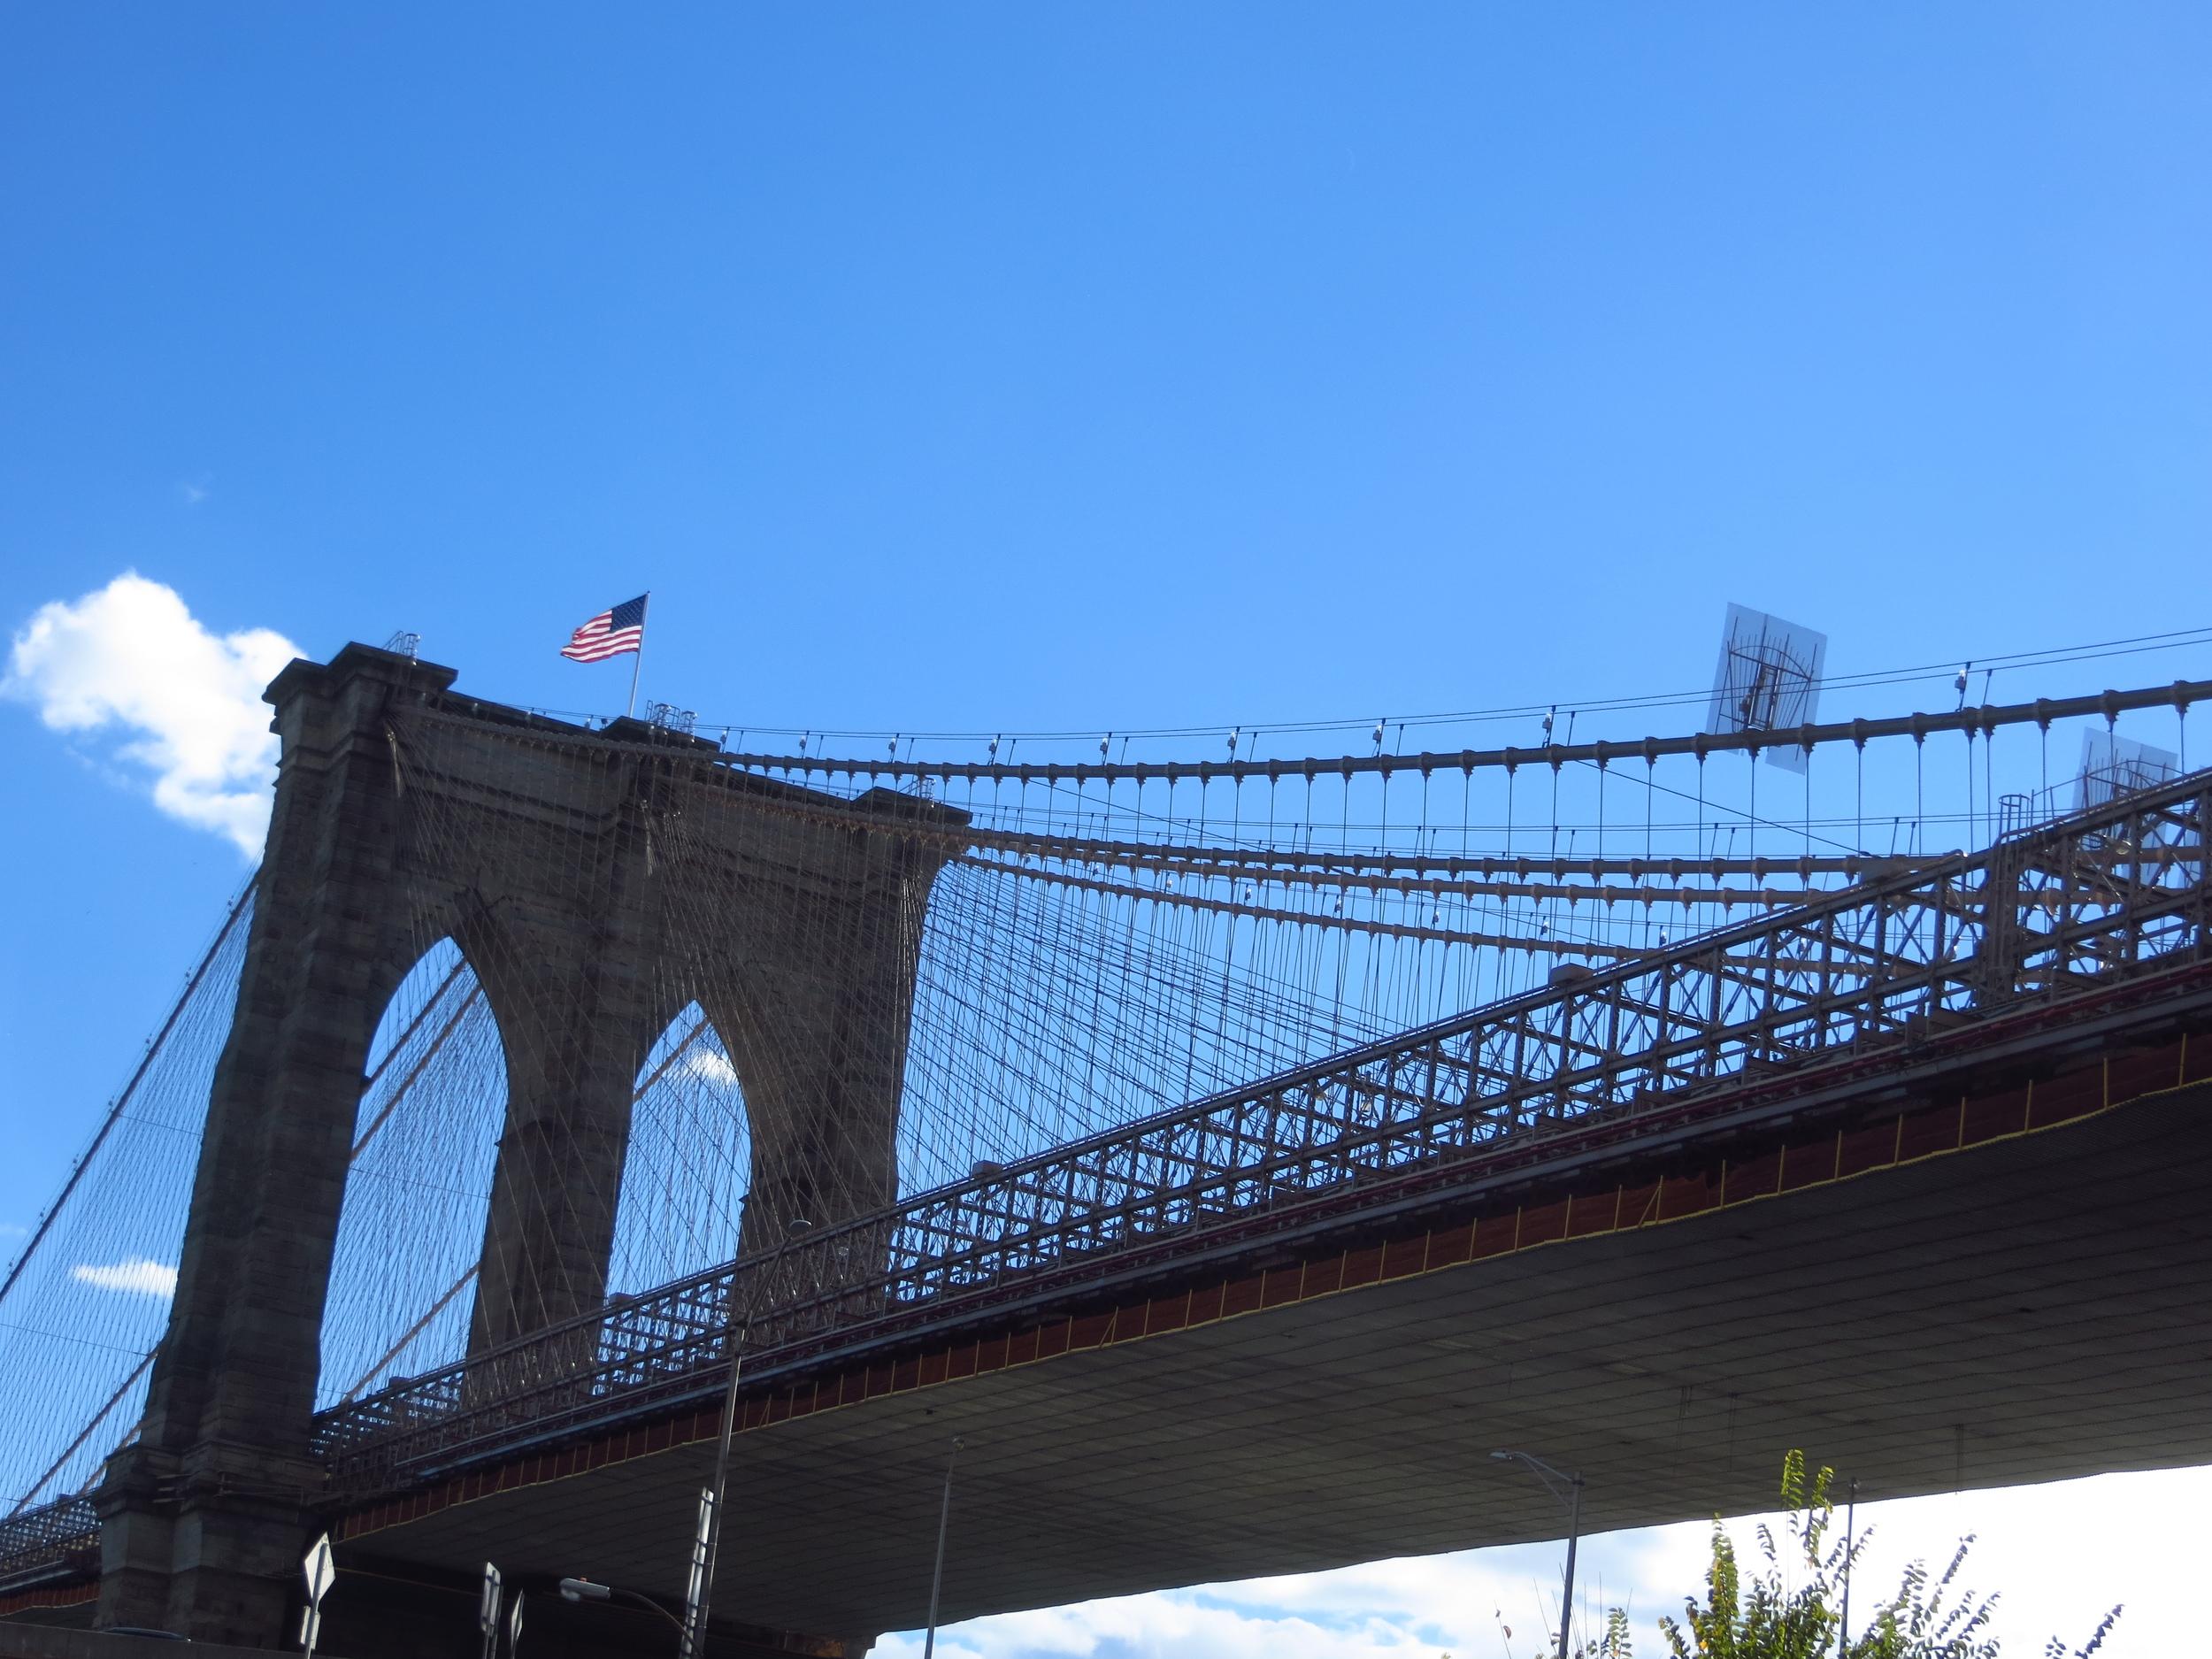 More Brooklyn Bridge